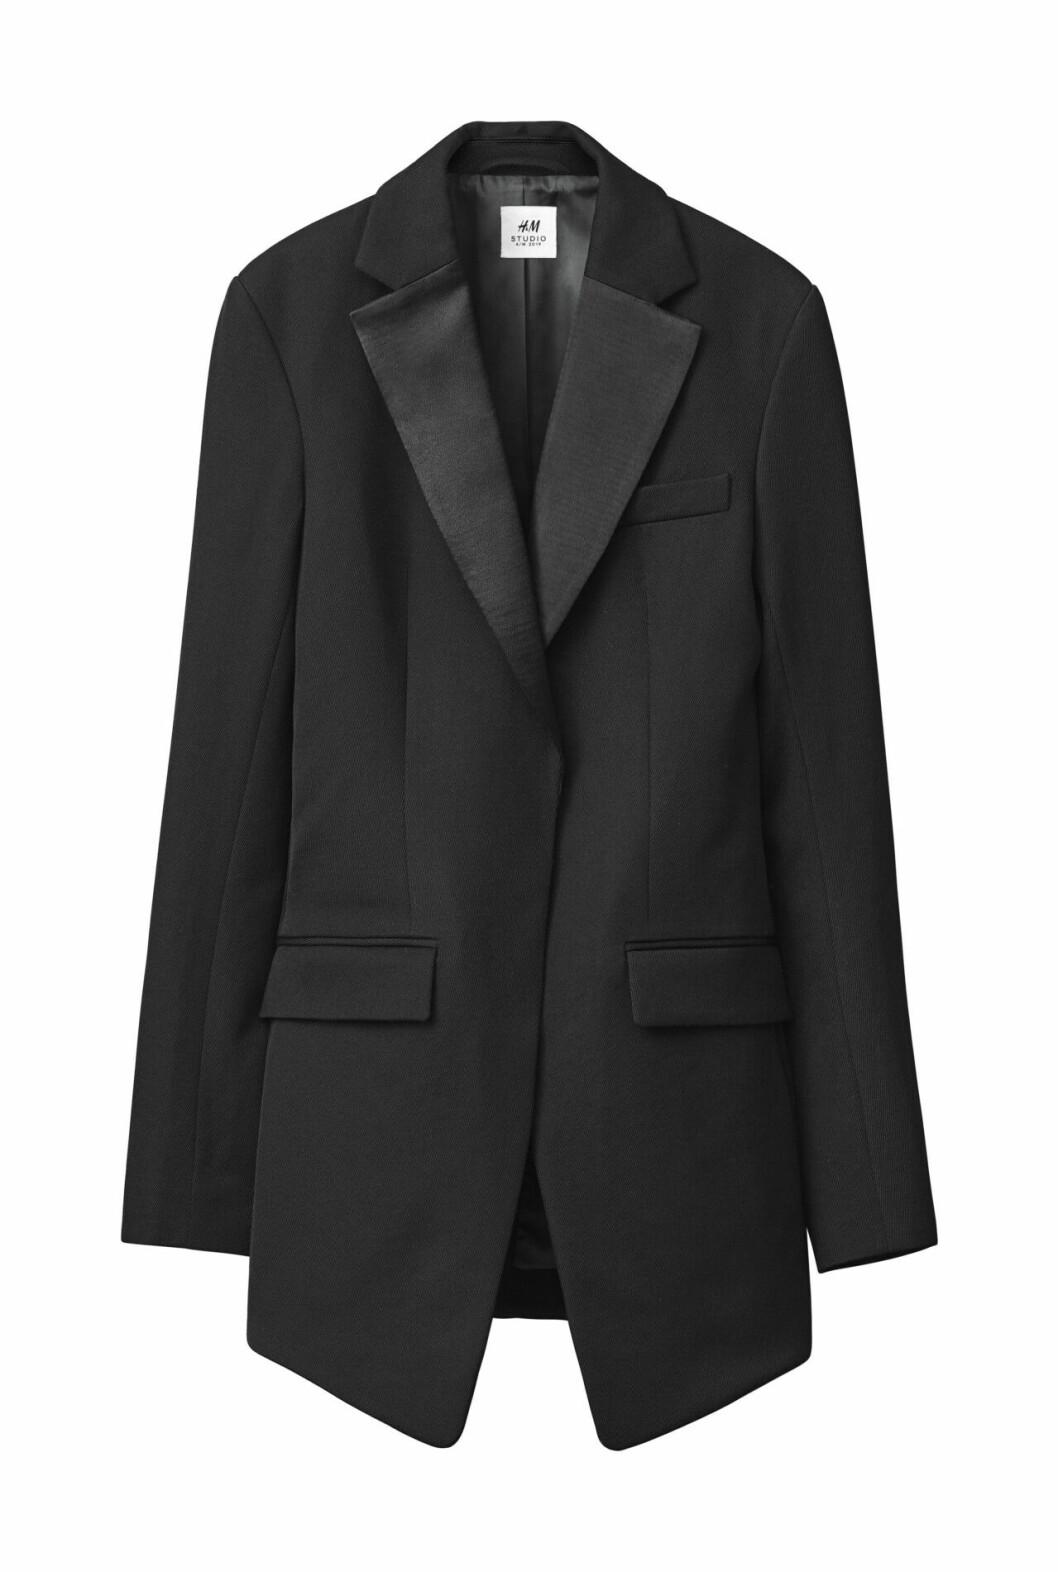 H&M Studio höstkollektion aw 2019 – svart kavaj